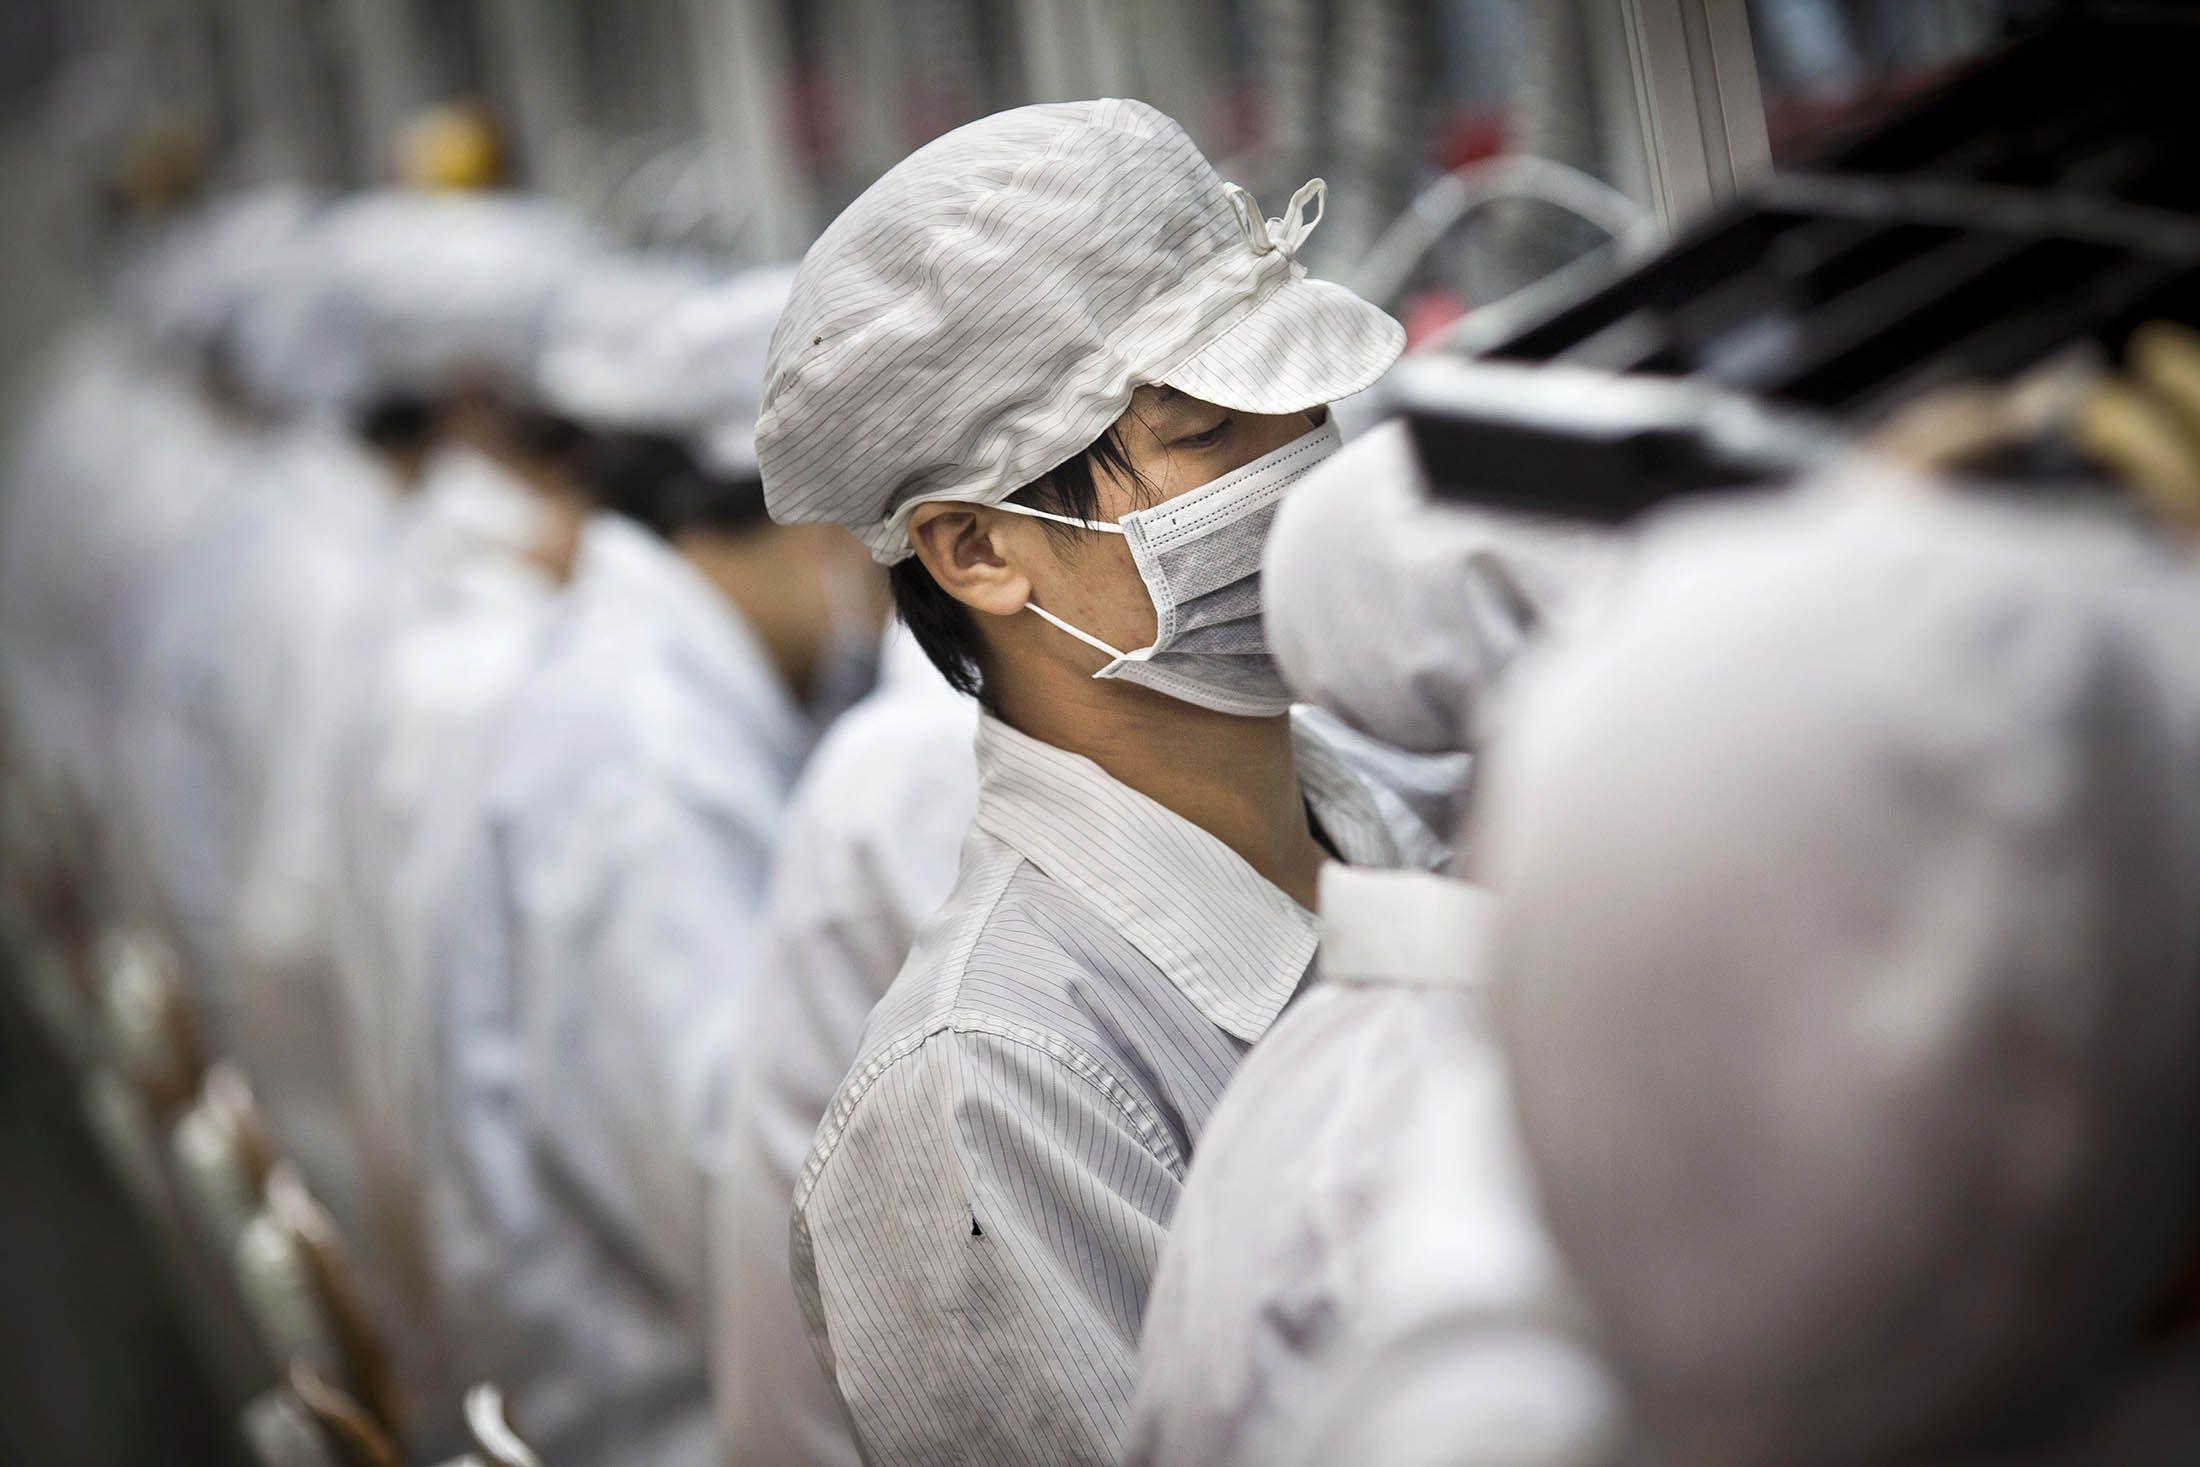 SupremeCapitalGroup on Contract jobs, Advanced